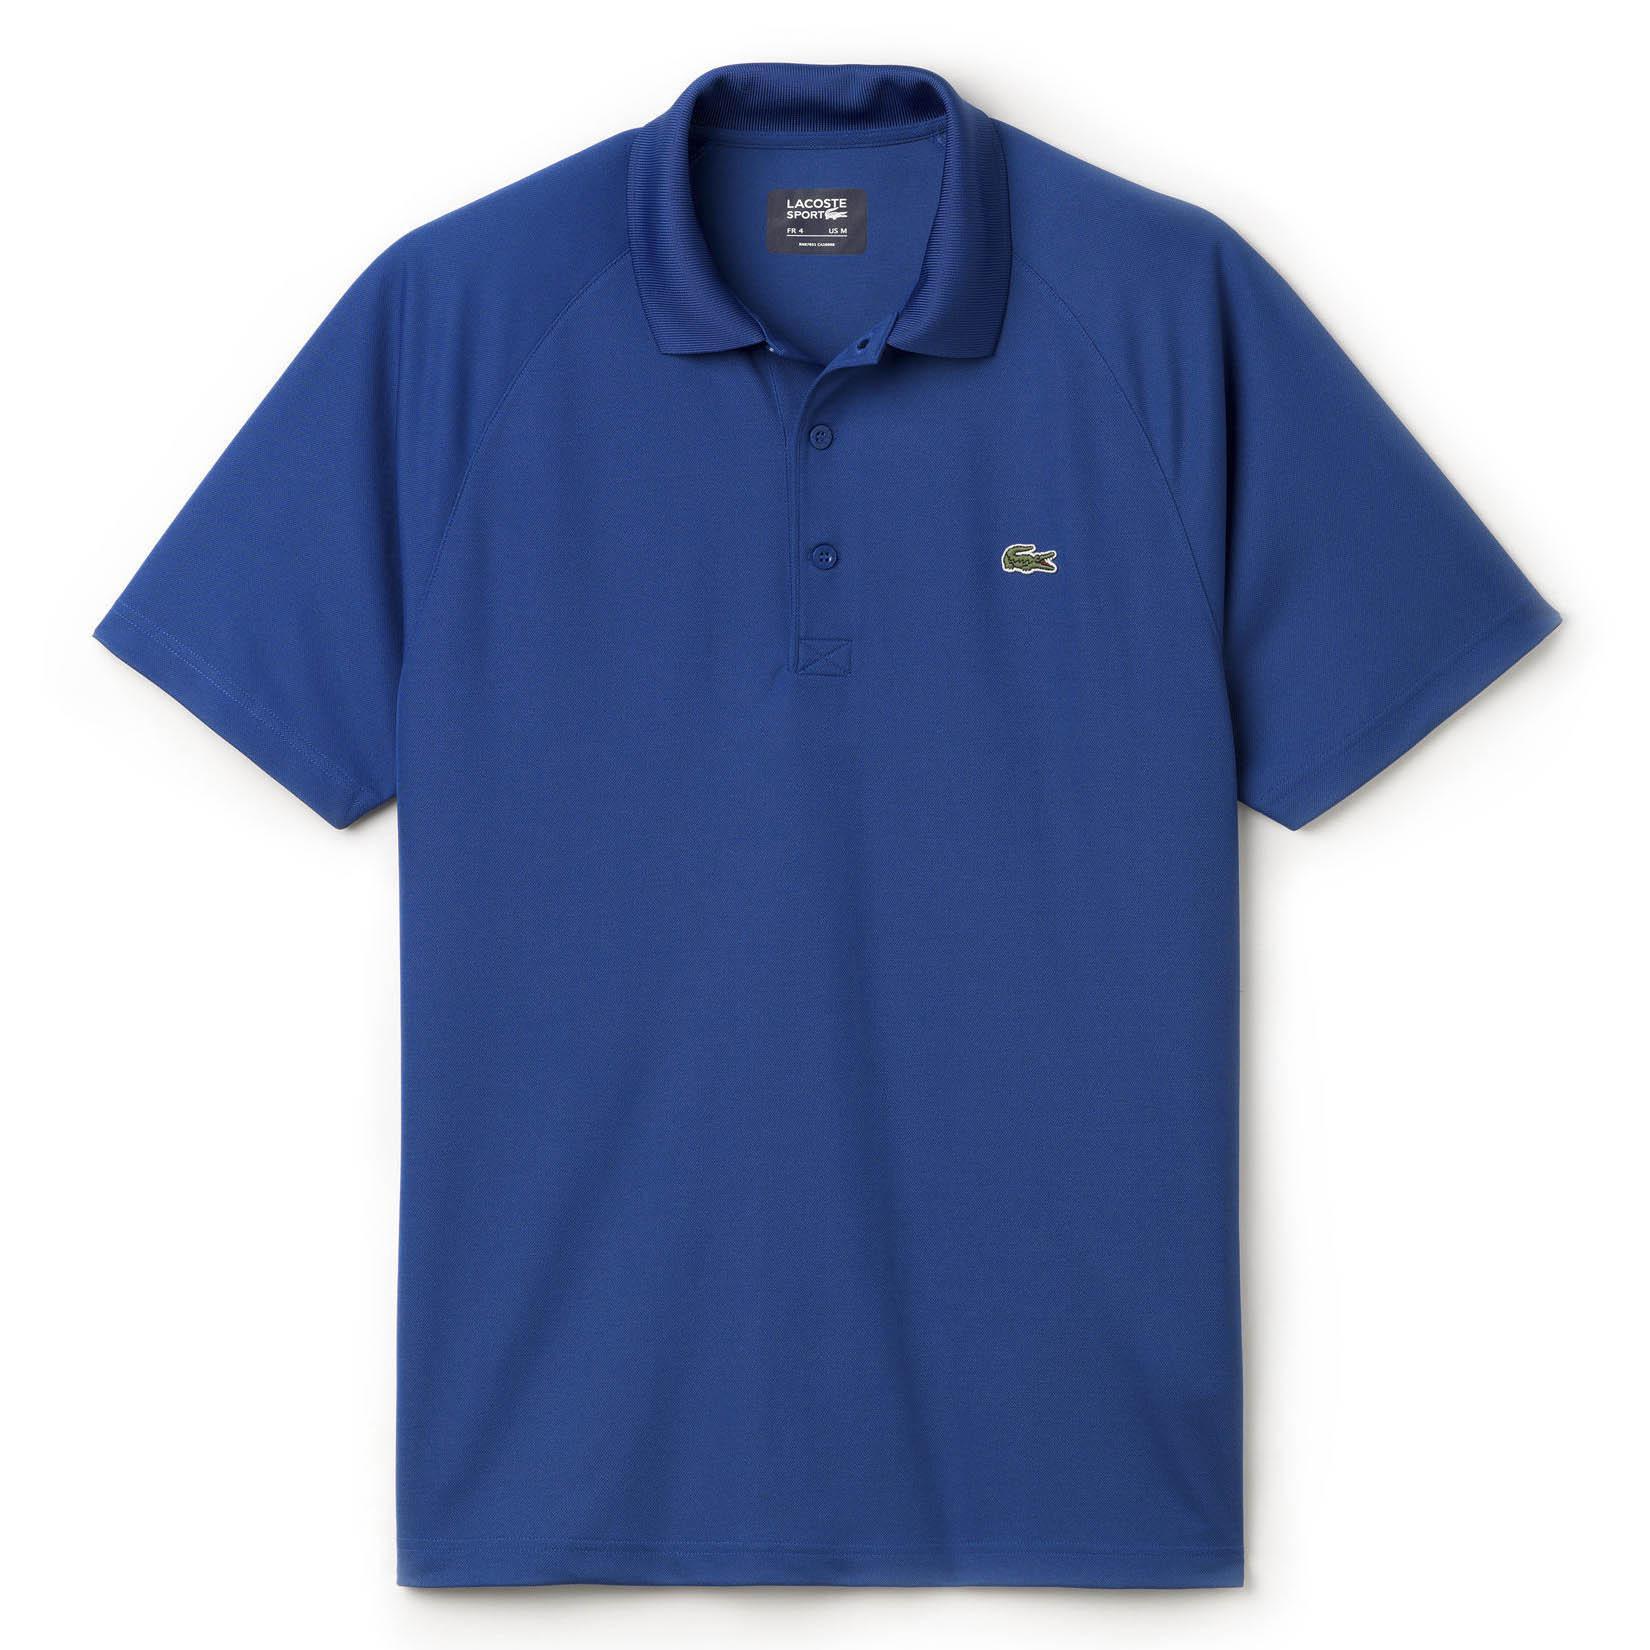 c8f7559f7 Lacoste Sport Mens Ultra Dry Raglan Sleeve Polo - Monaco Blue -  Tennisnuts.com